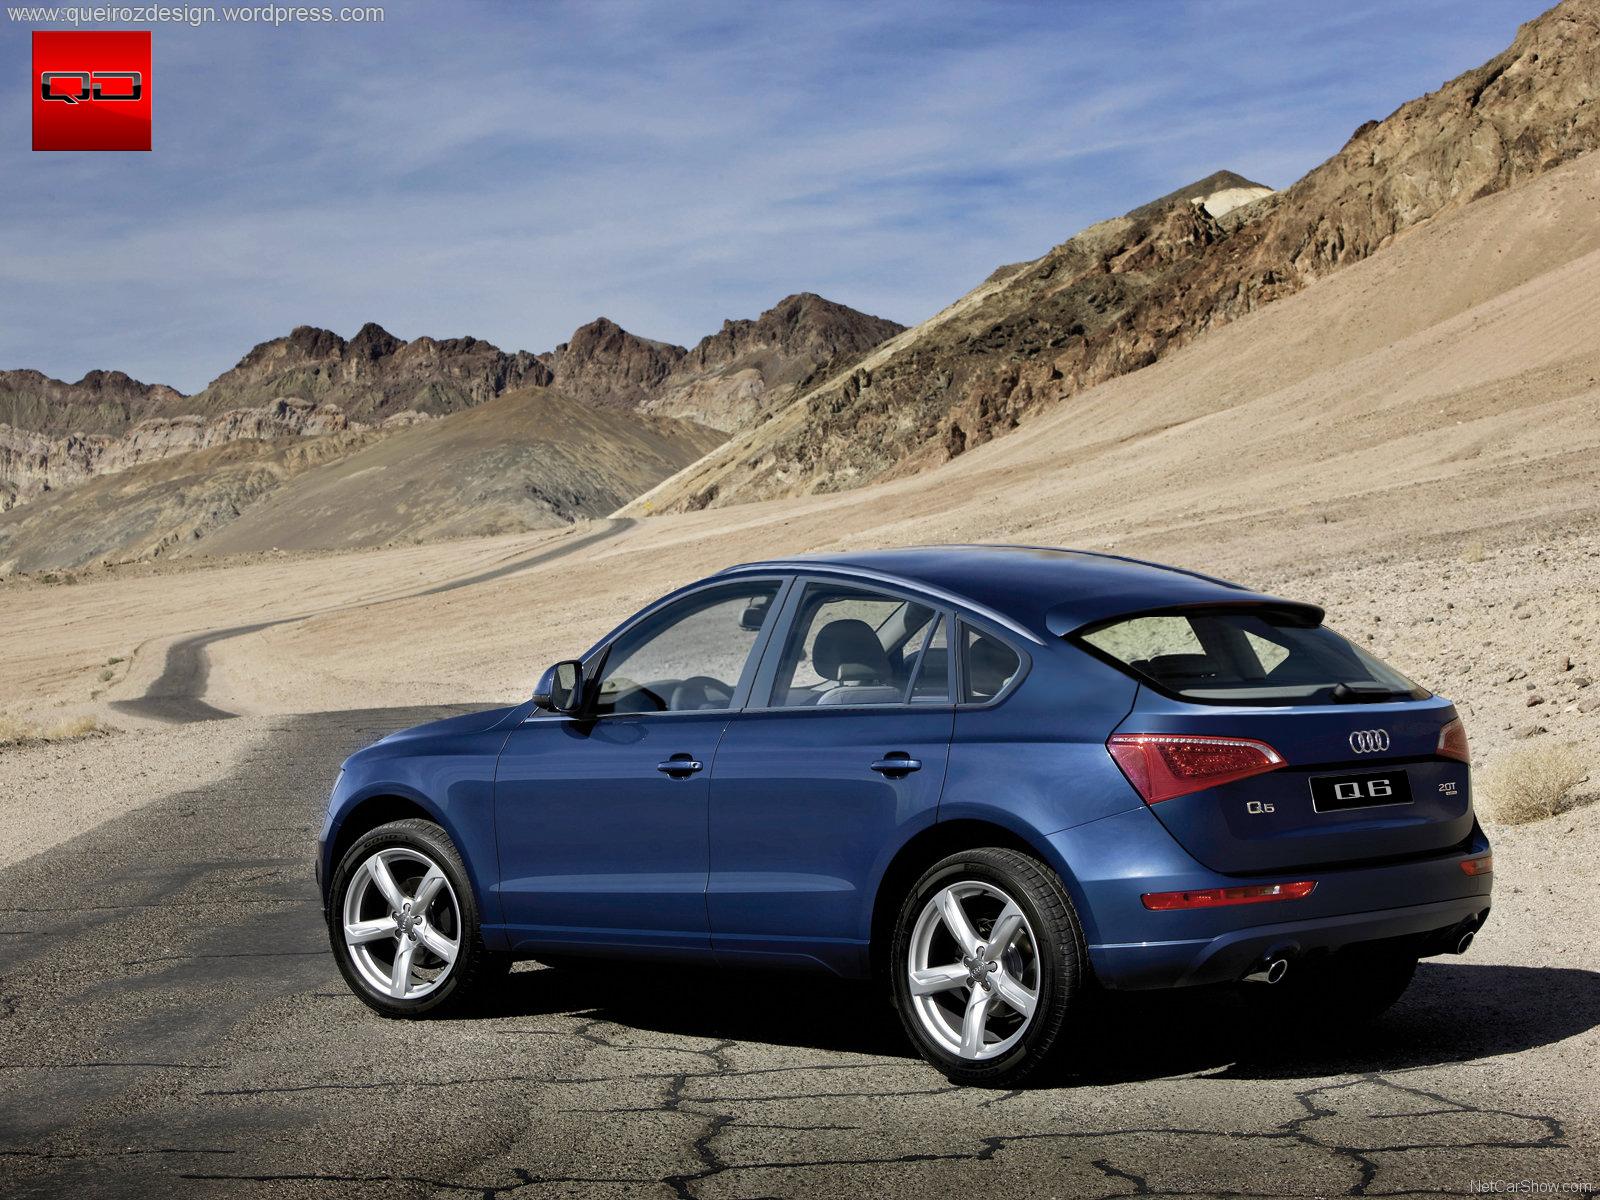 Audi Q6 Photos Photogallery With 2 Pics Carsbase Com